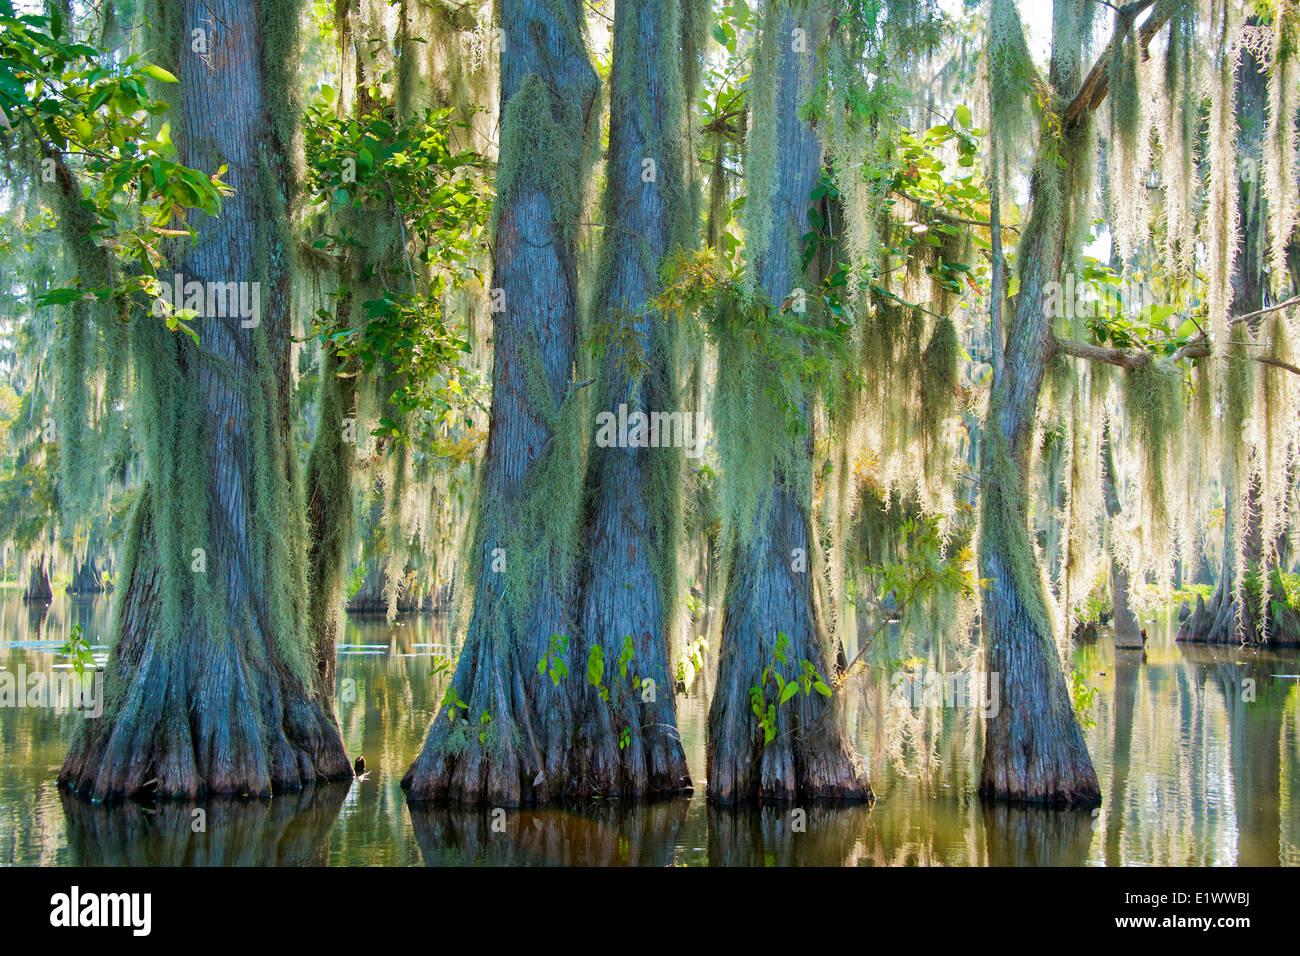 Cypress swamp, Achafalaya River Basin, le sud de la Louisiane, États-Unis Photo Stock